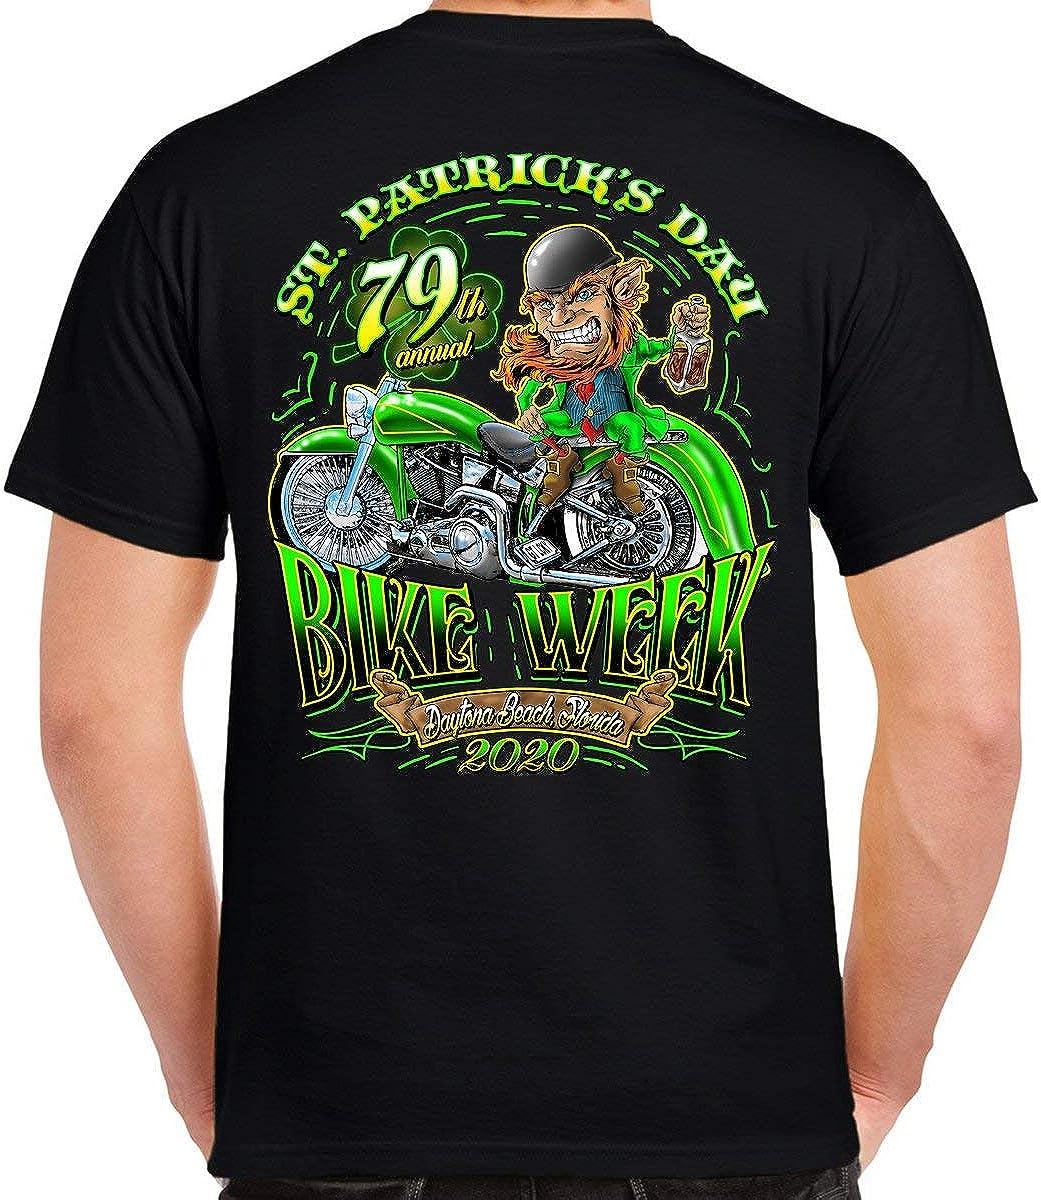 2020 Bike Week Daytona Beach St. Pattys T-Shirt